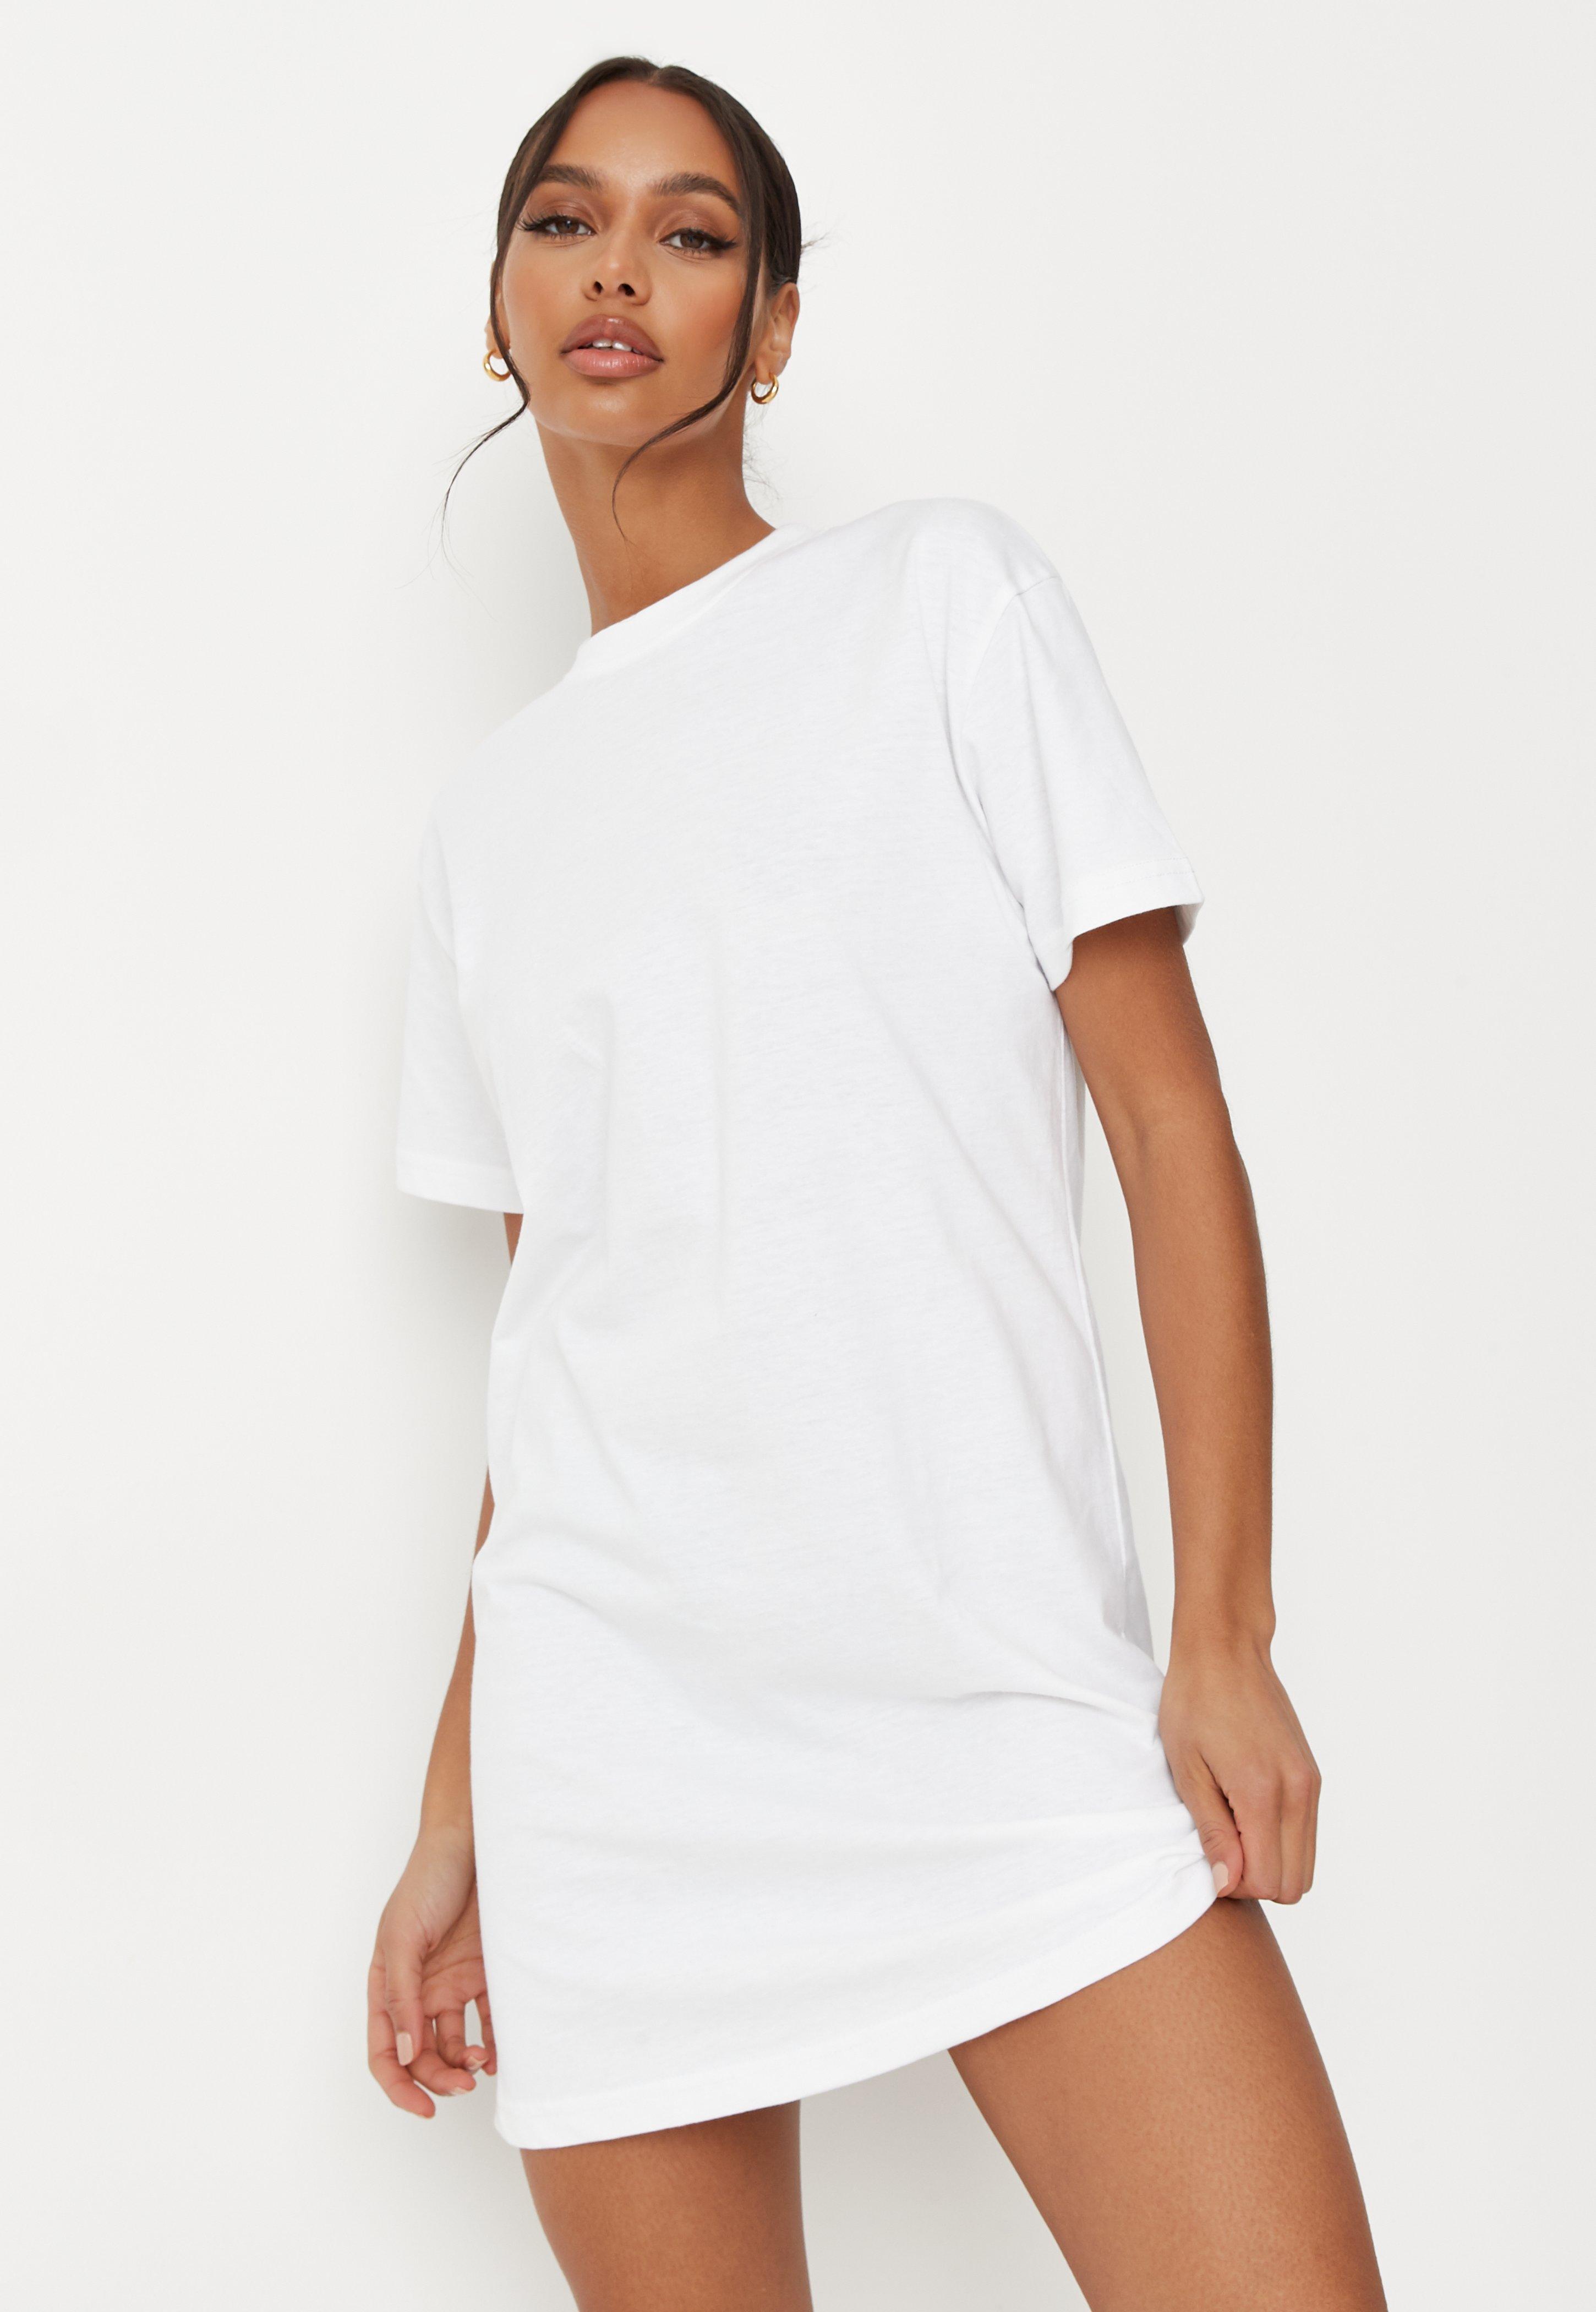 defe6a1709bc T Shirt Dresses | Printed & Slogan T-Shirt Dresses - Missguided